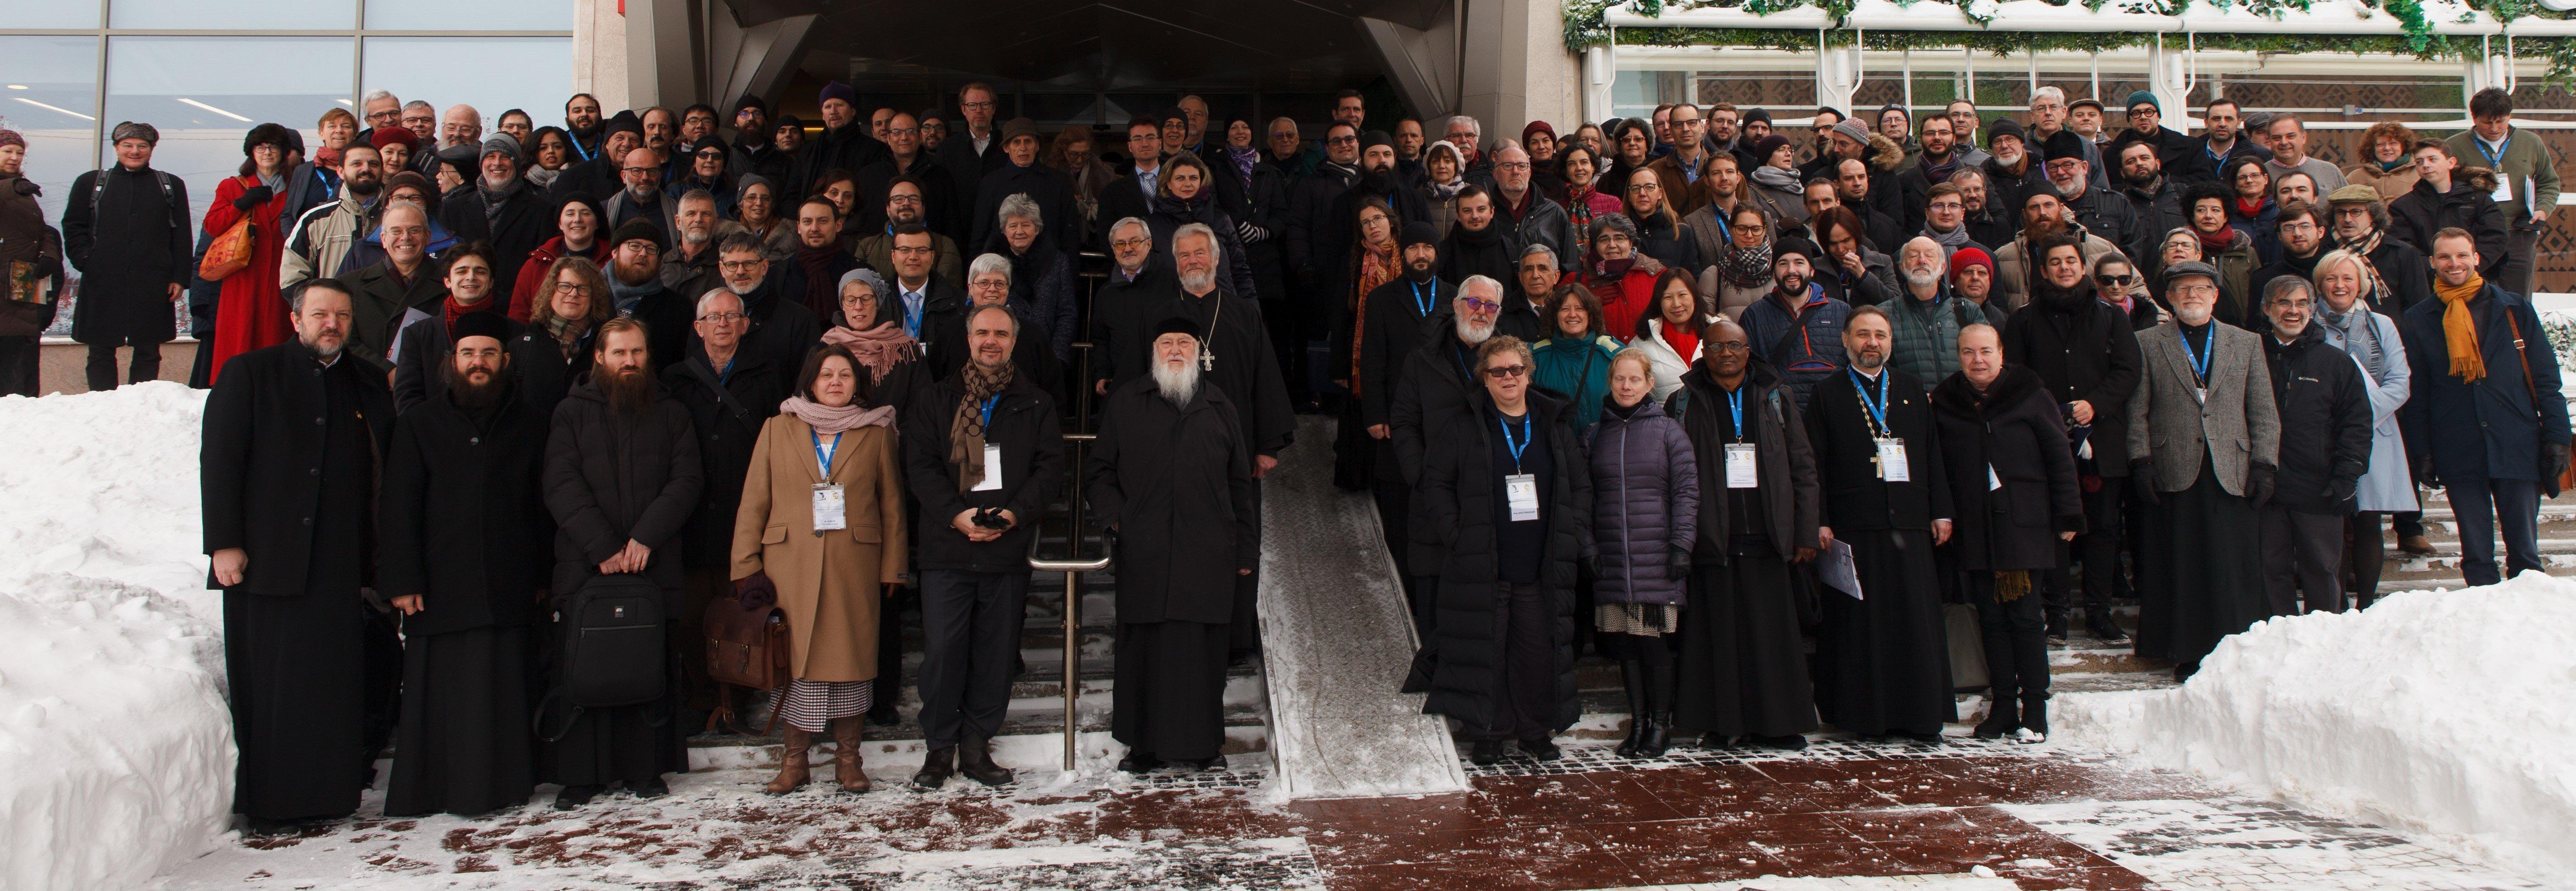 IOTA's inaugural conference: